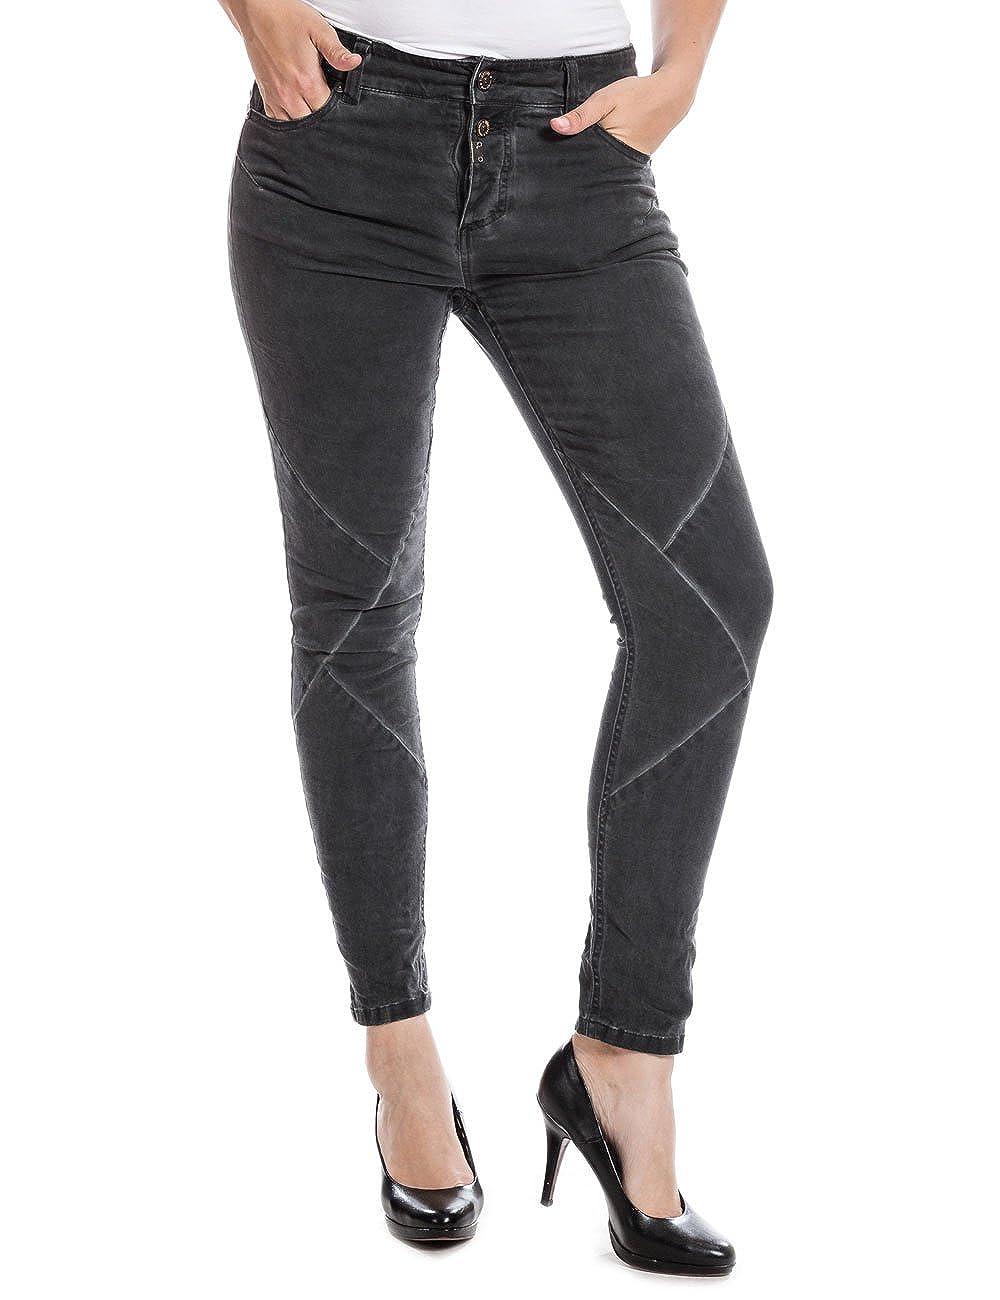 Timezone Neelatz Fashion Pants, Pantalones para Mujer